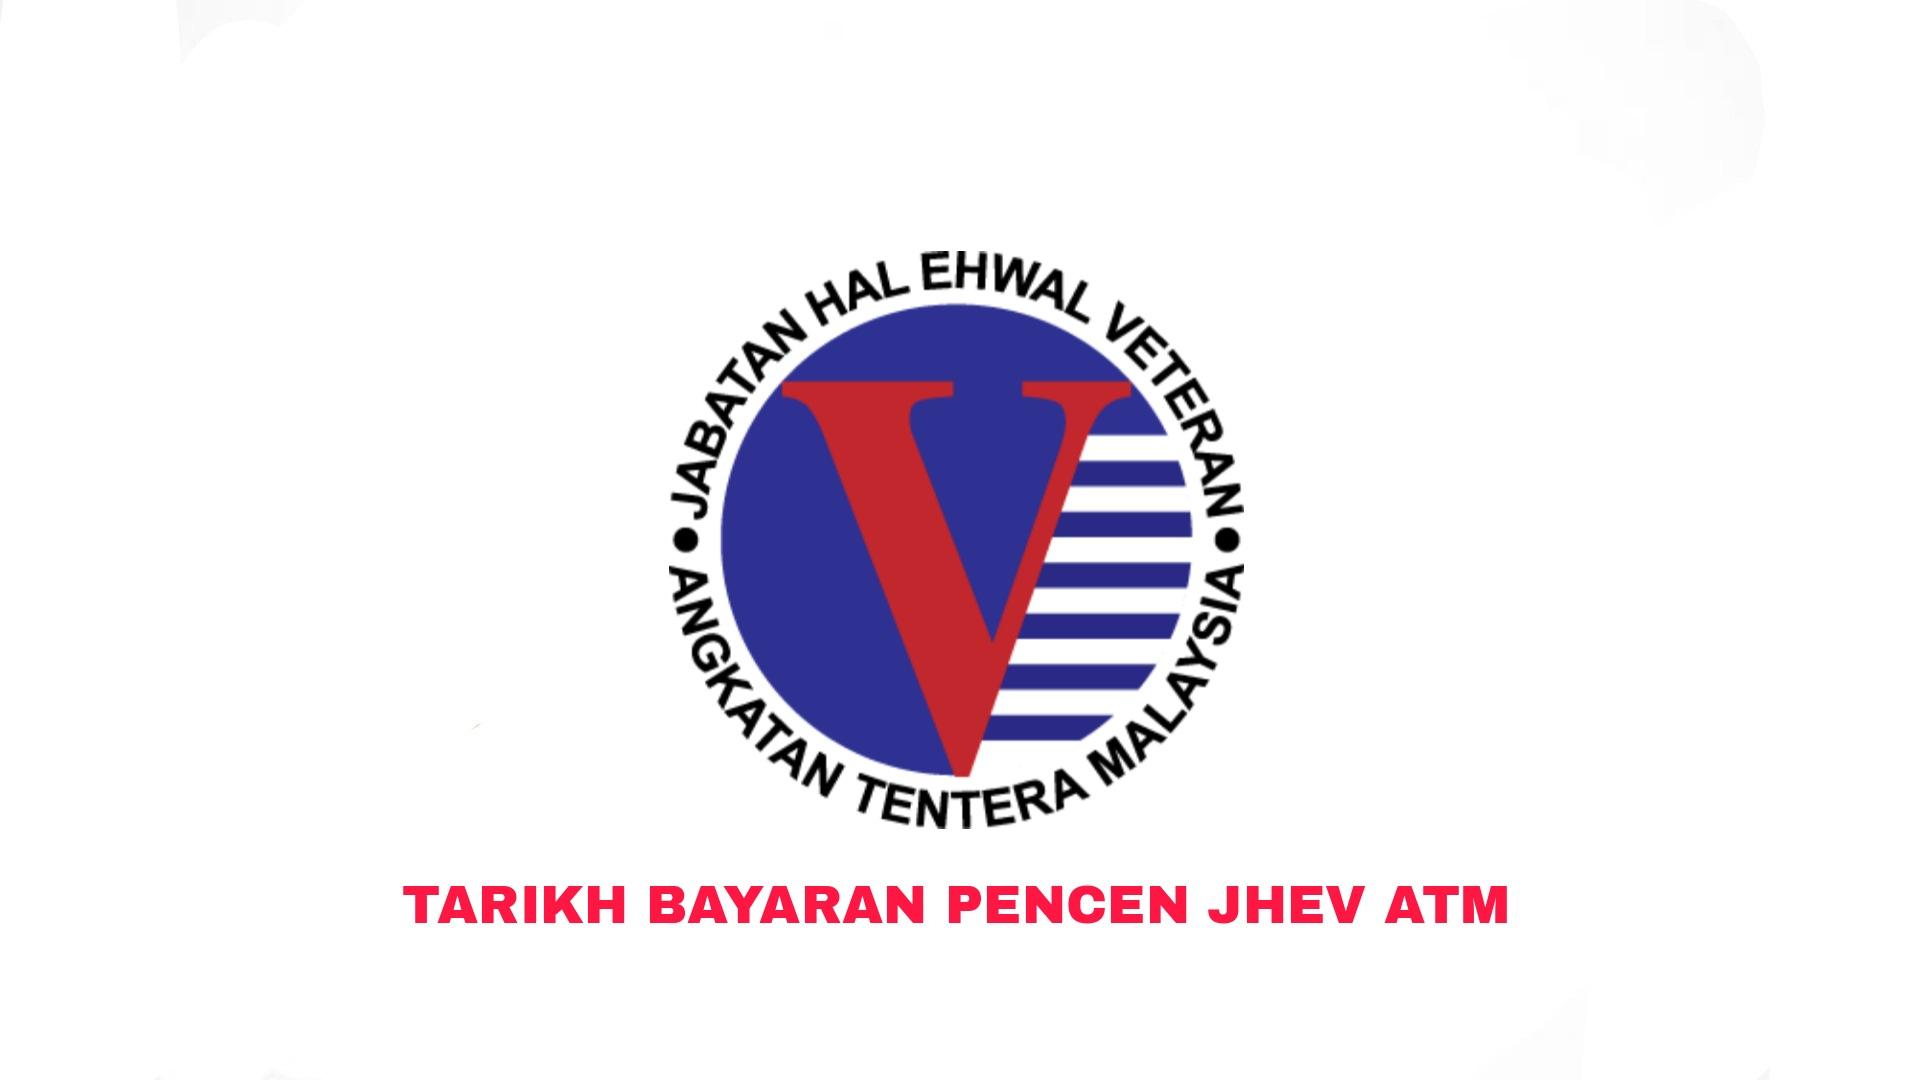 Tarikh Bayaran Pencen JHEV ATM 2021 (Jadual)